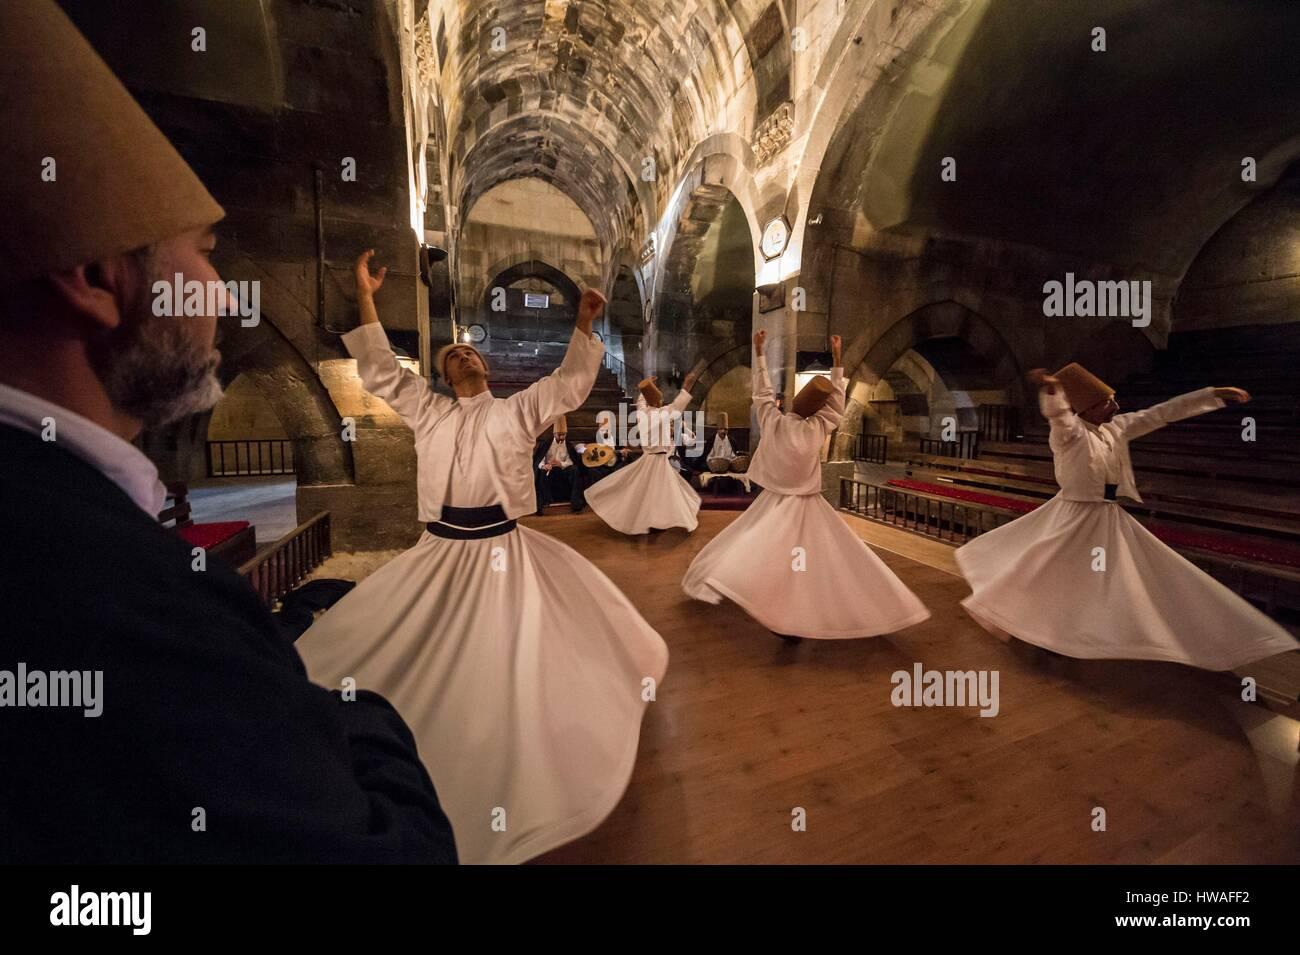 Turkey, Cappadocia, Avanos, whirling dervishes turn looking for mystical ecstasy in Seljuk caravanserai Sarihan - Stock Image